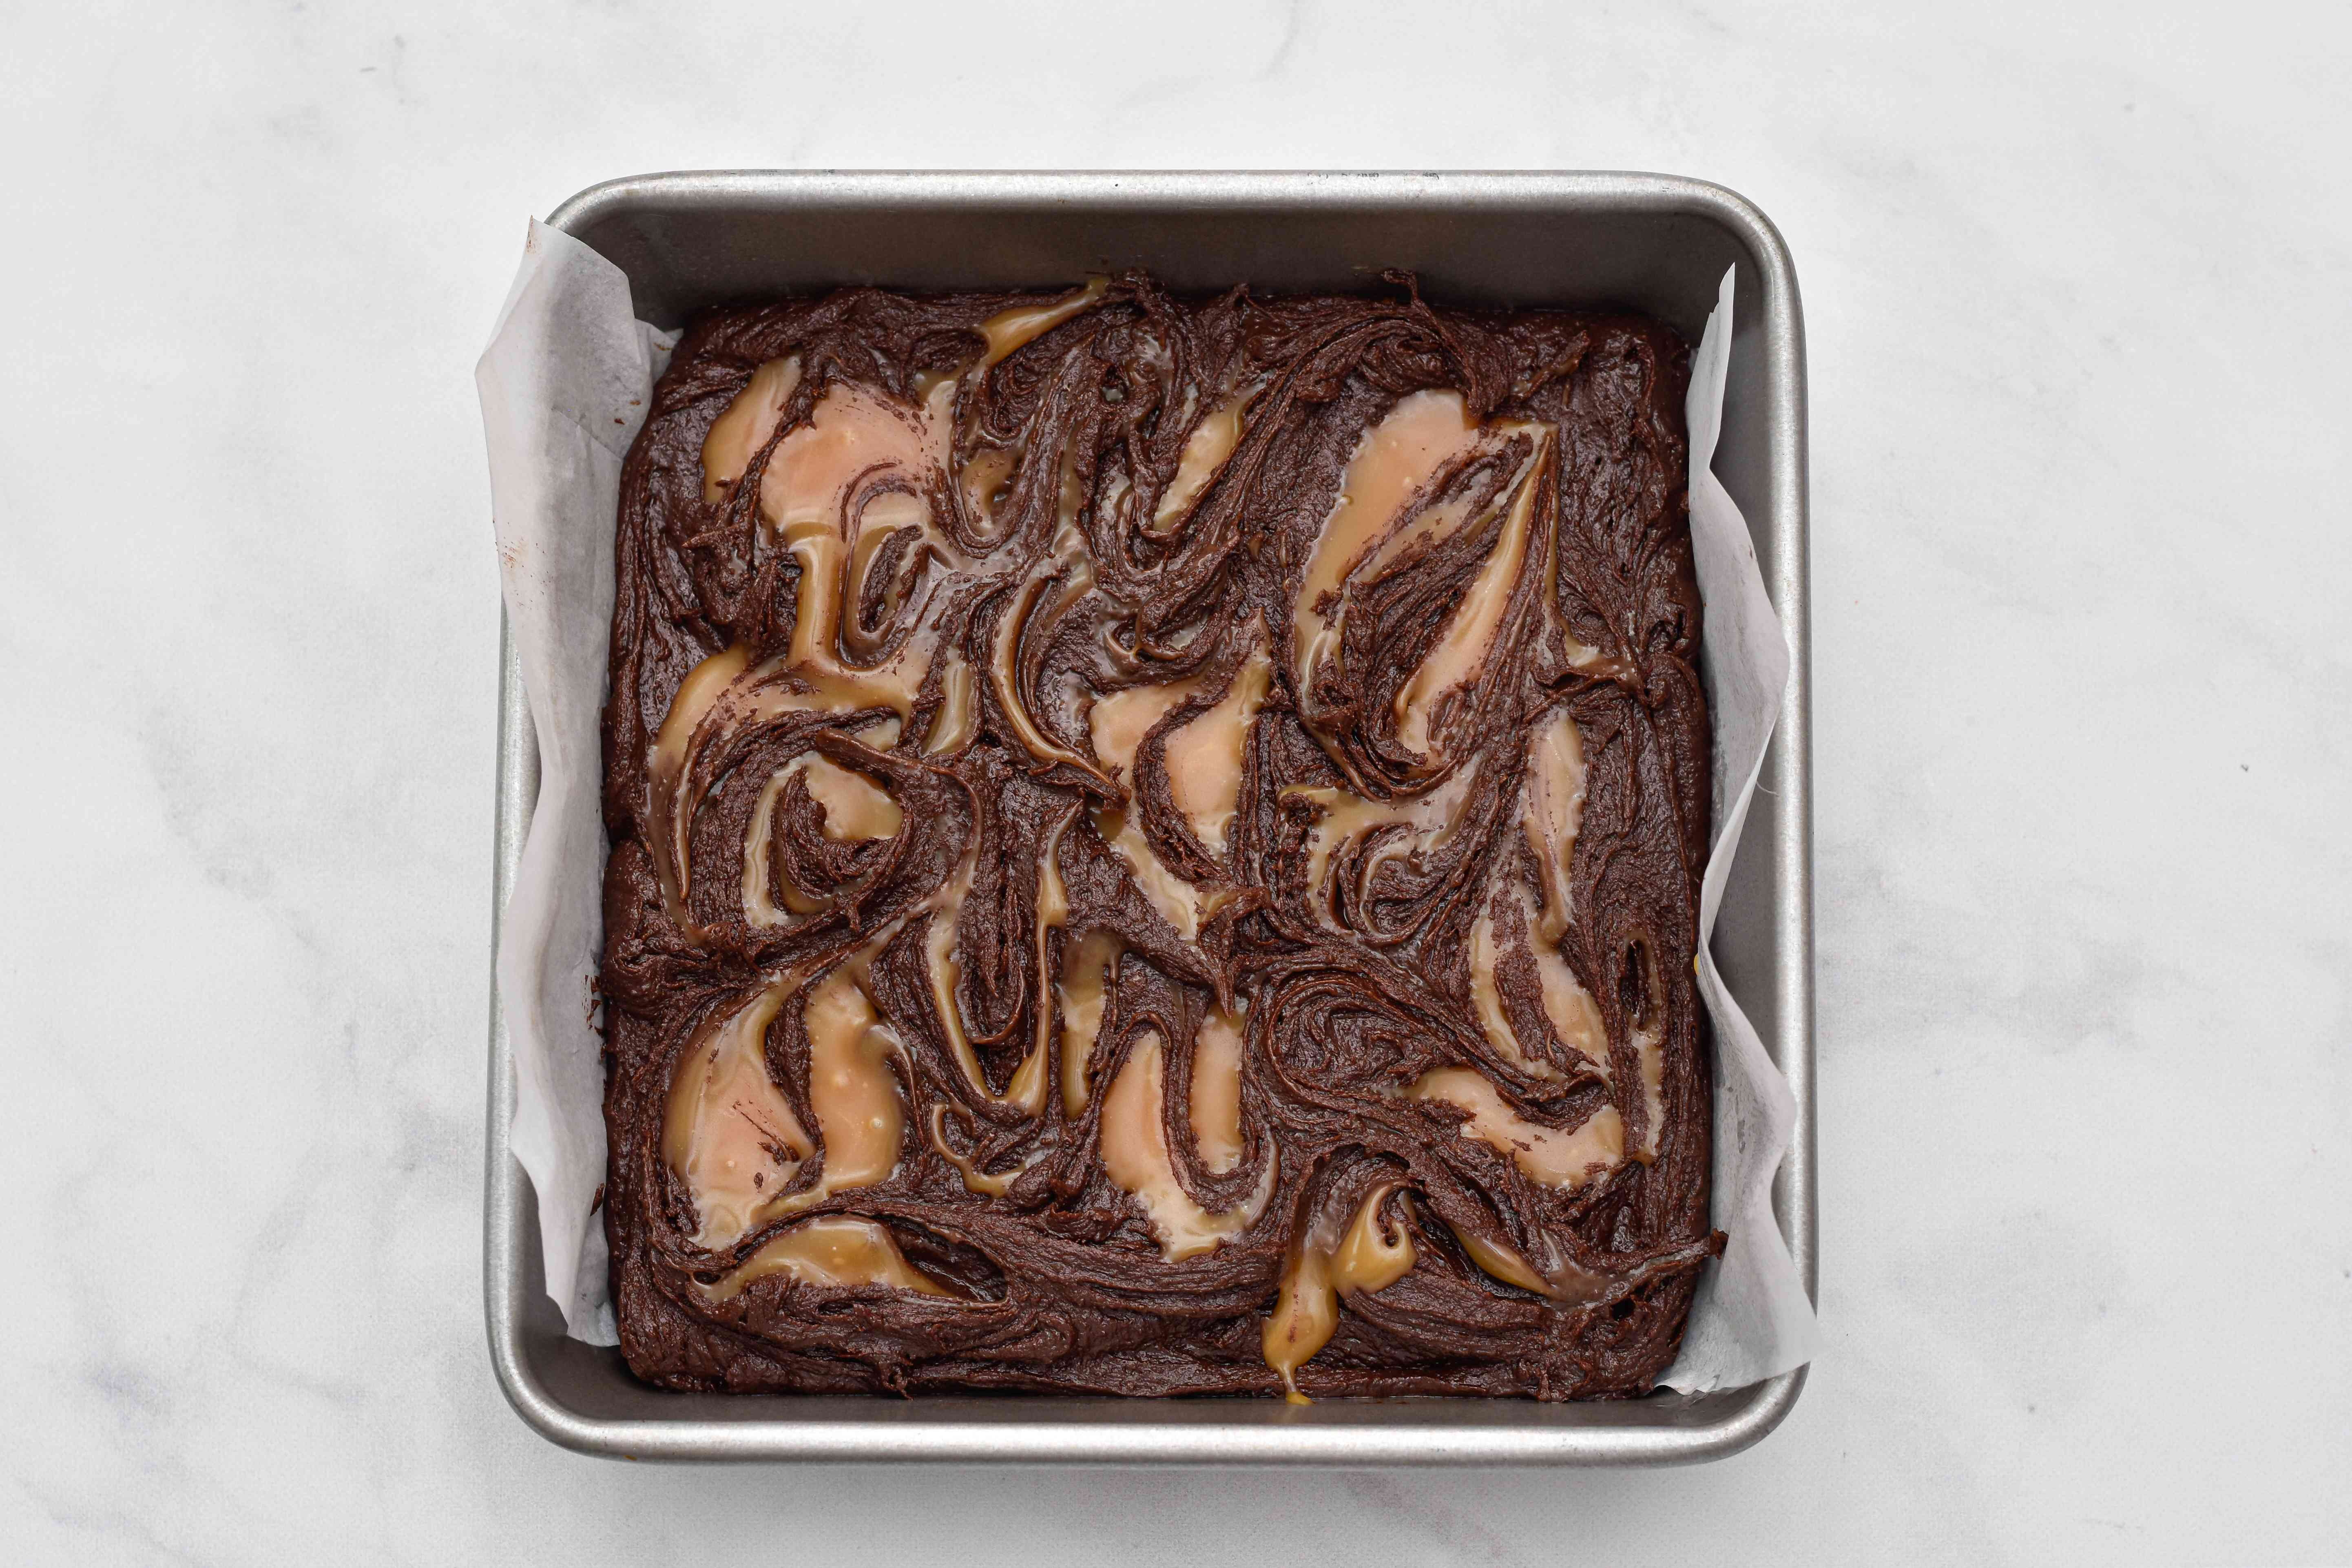 Fudgy Caramel Swirl Brownies in a pan